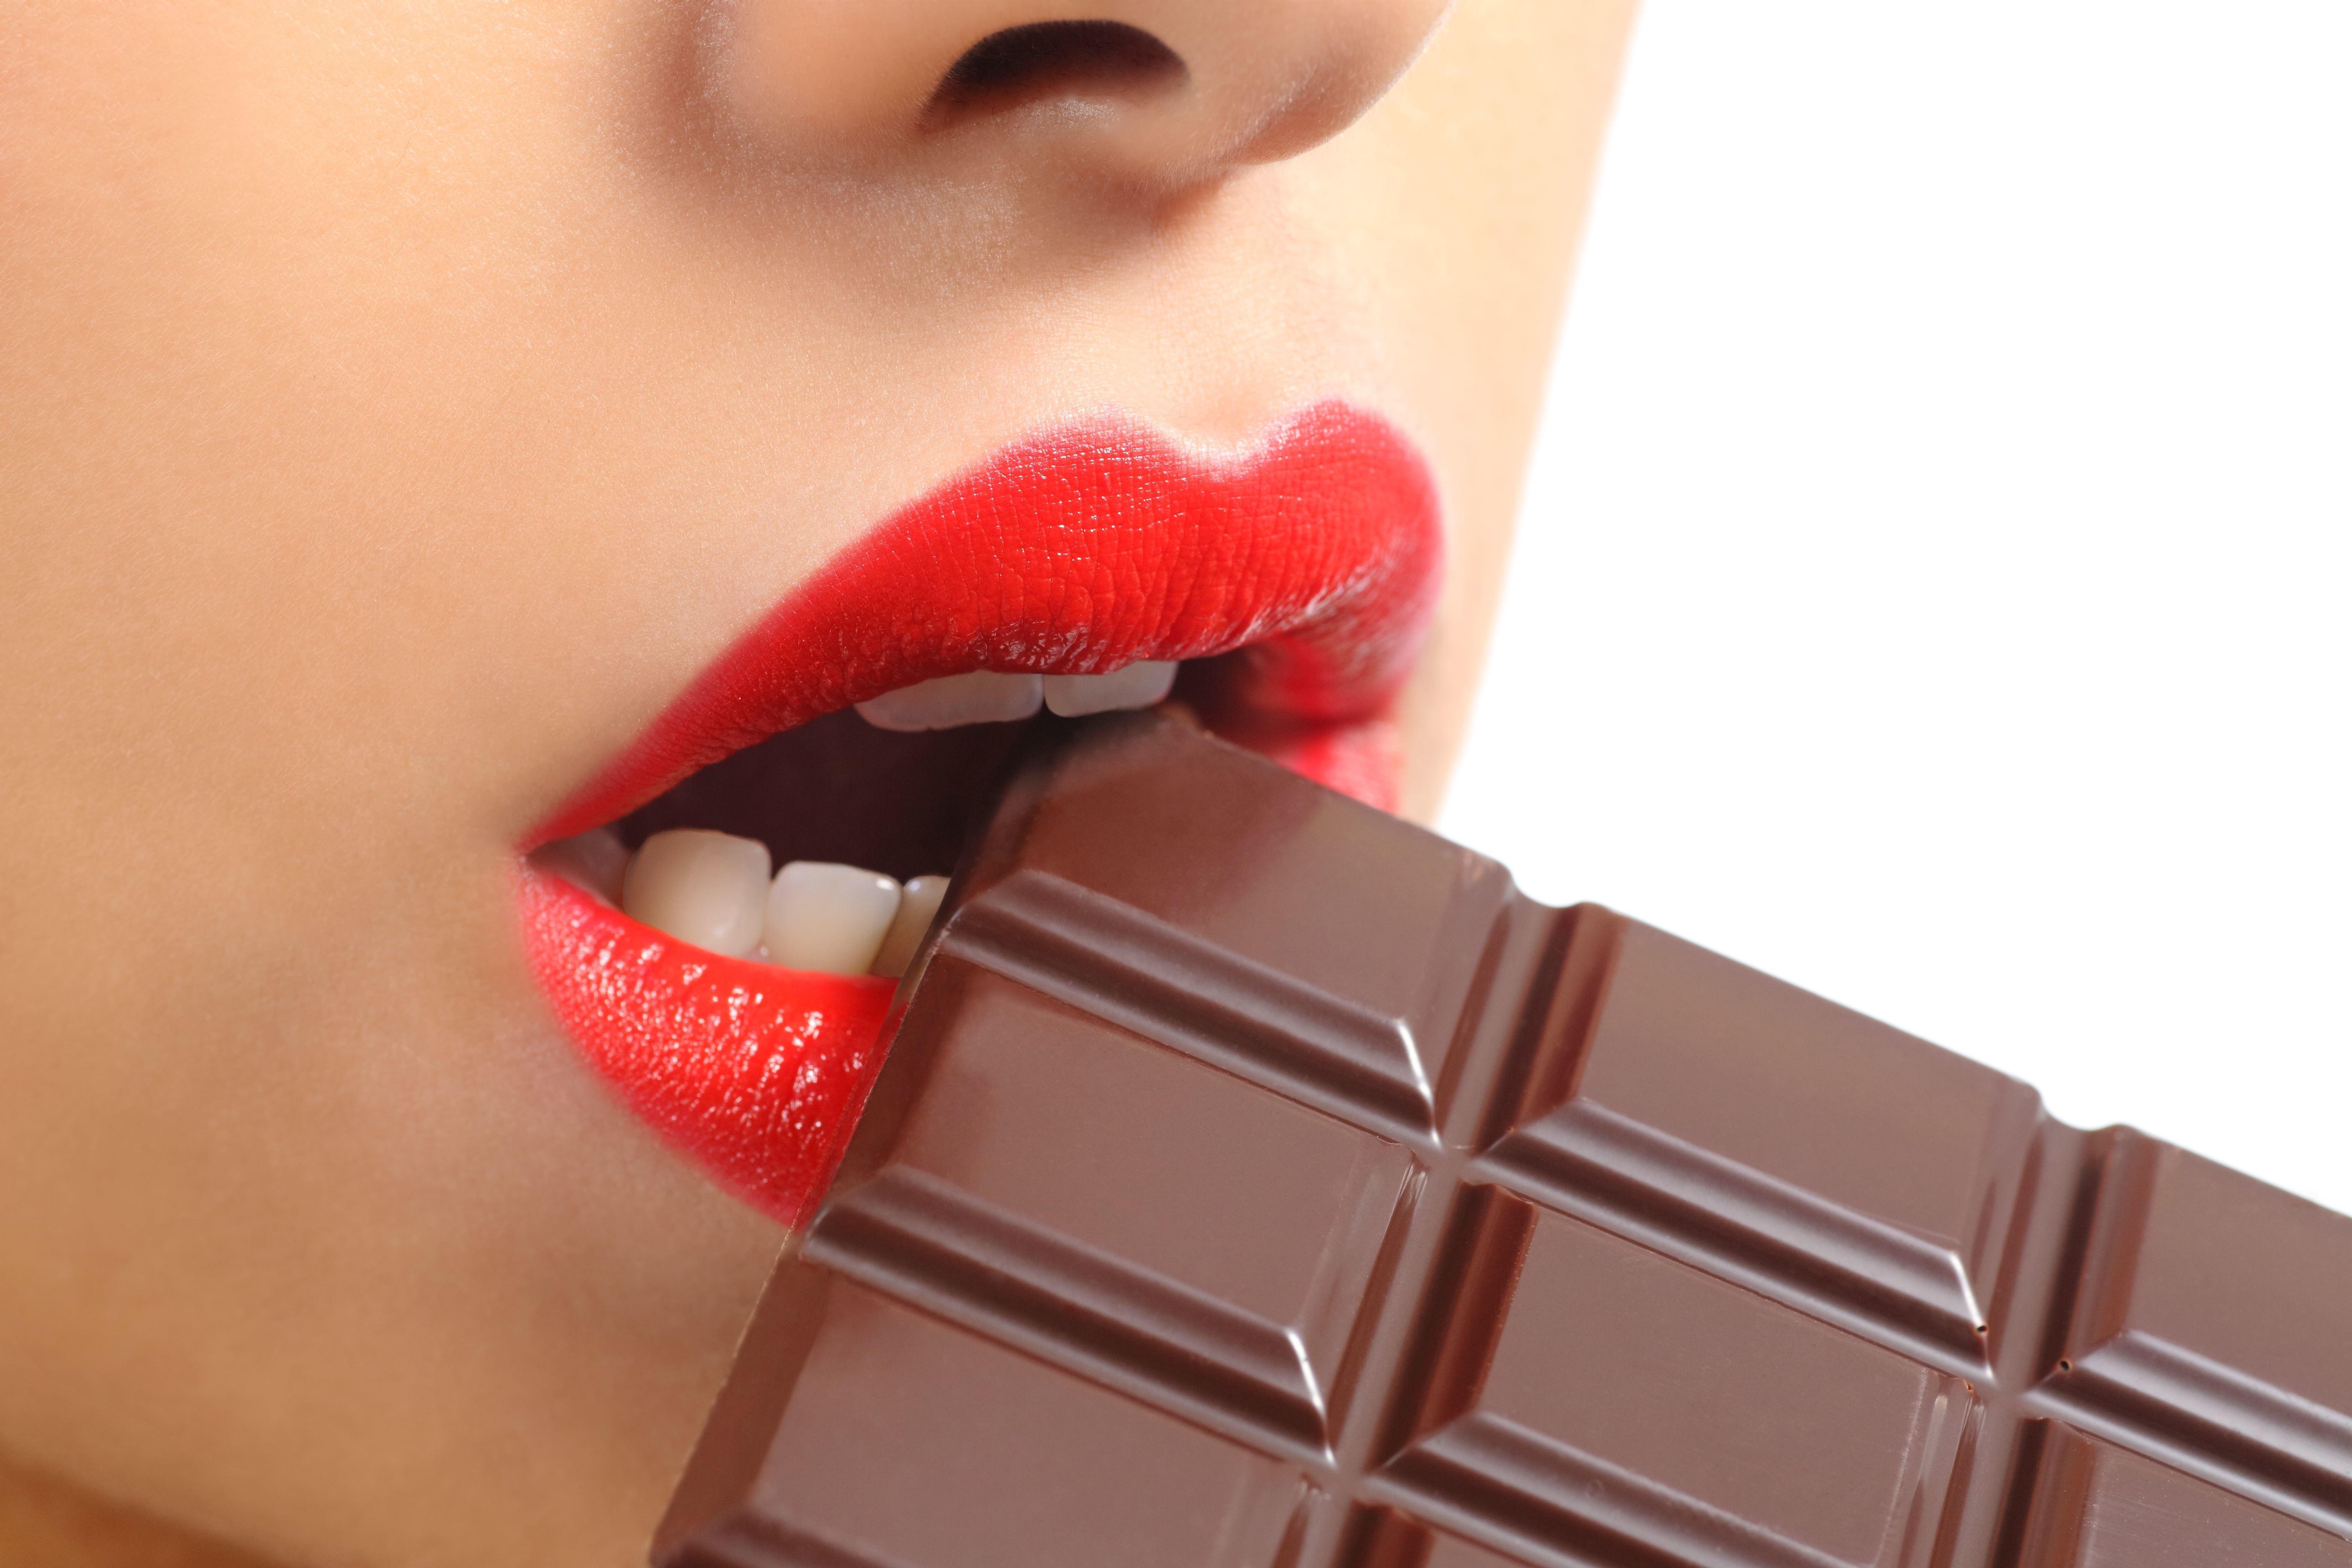 Шоколадки фото с девушками